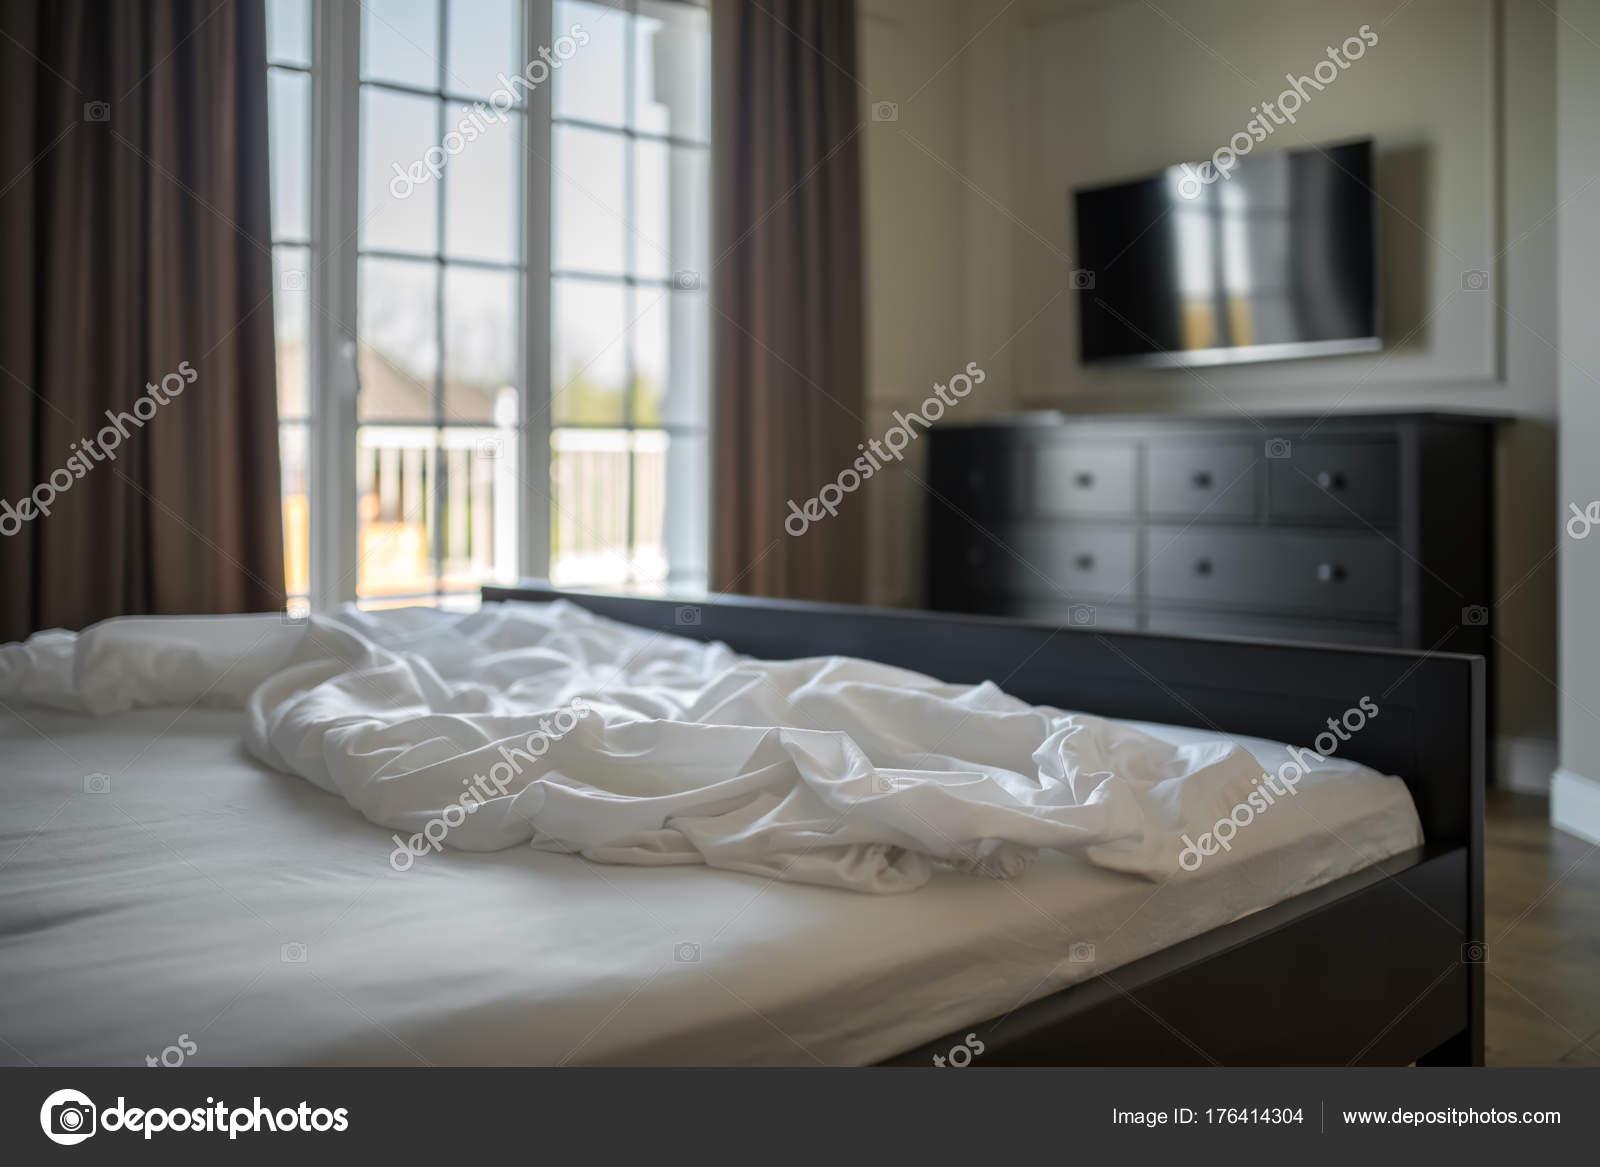 Slaapkamer in moderne stijl u2014 stockfoto © bezikus #176414304